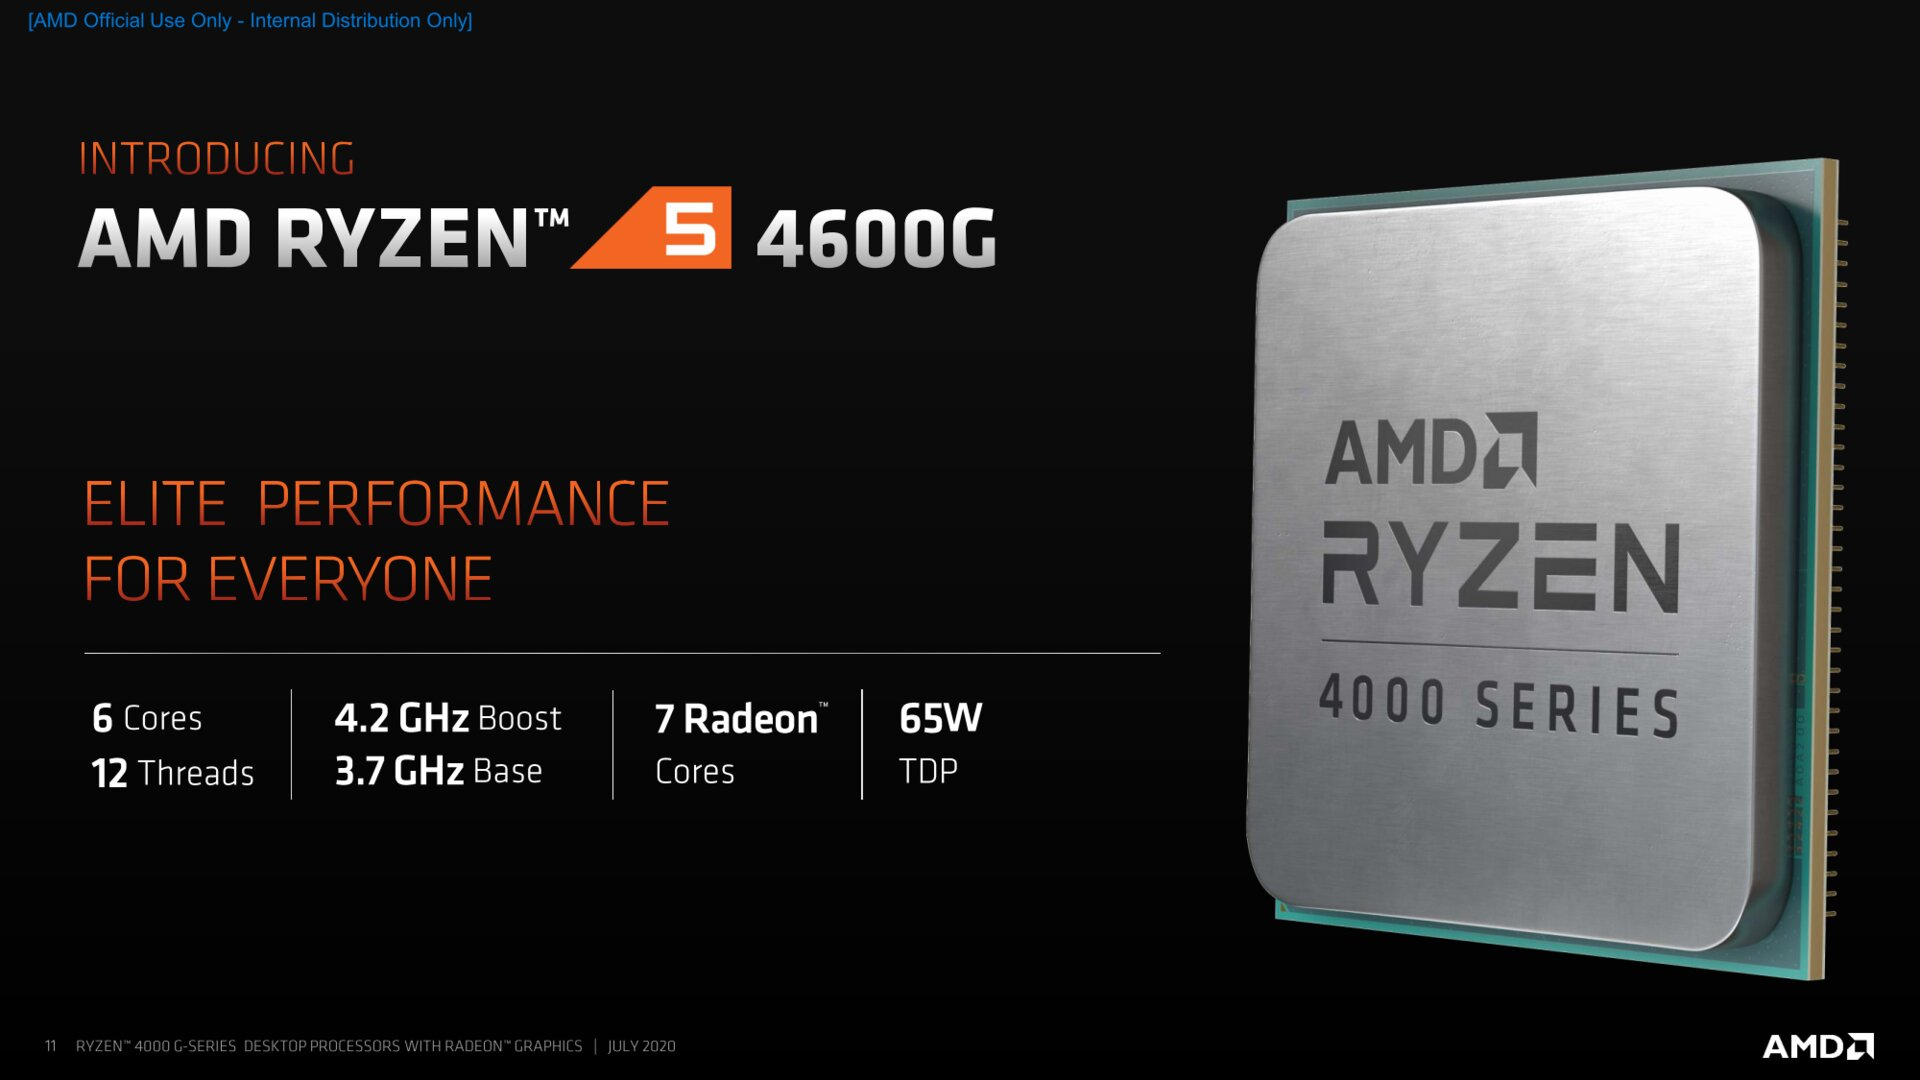 Ryzen 5 4600G